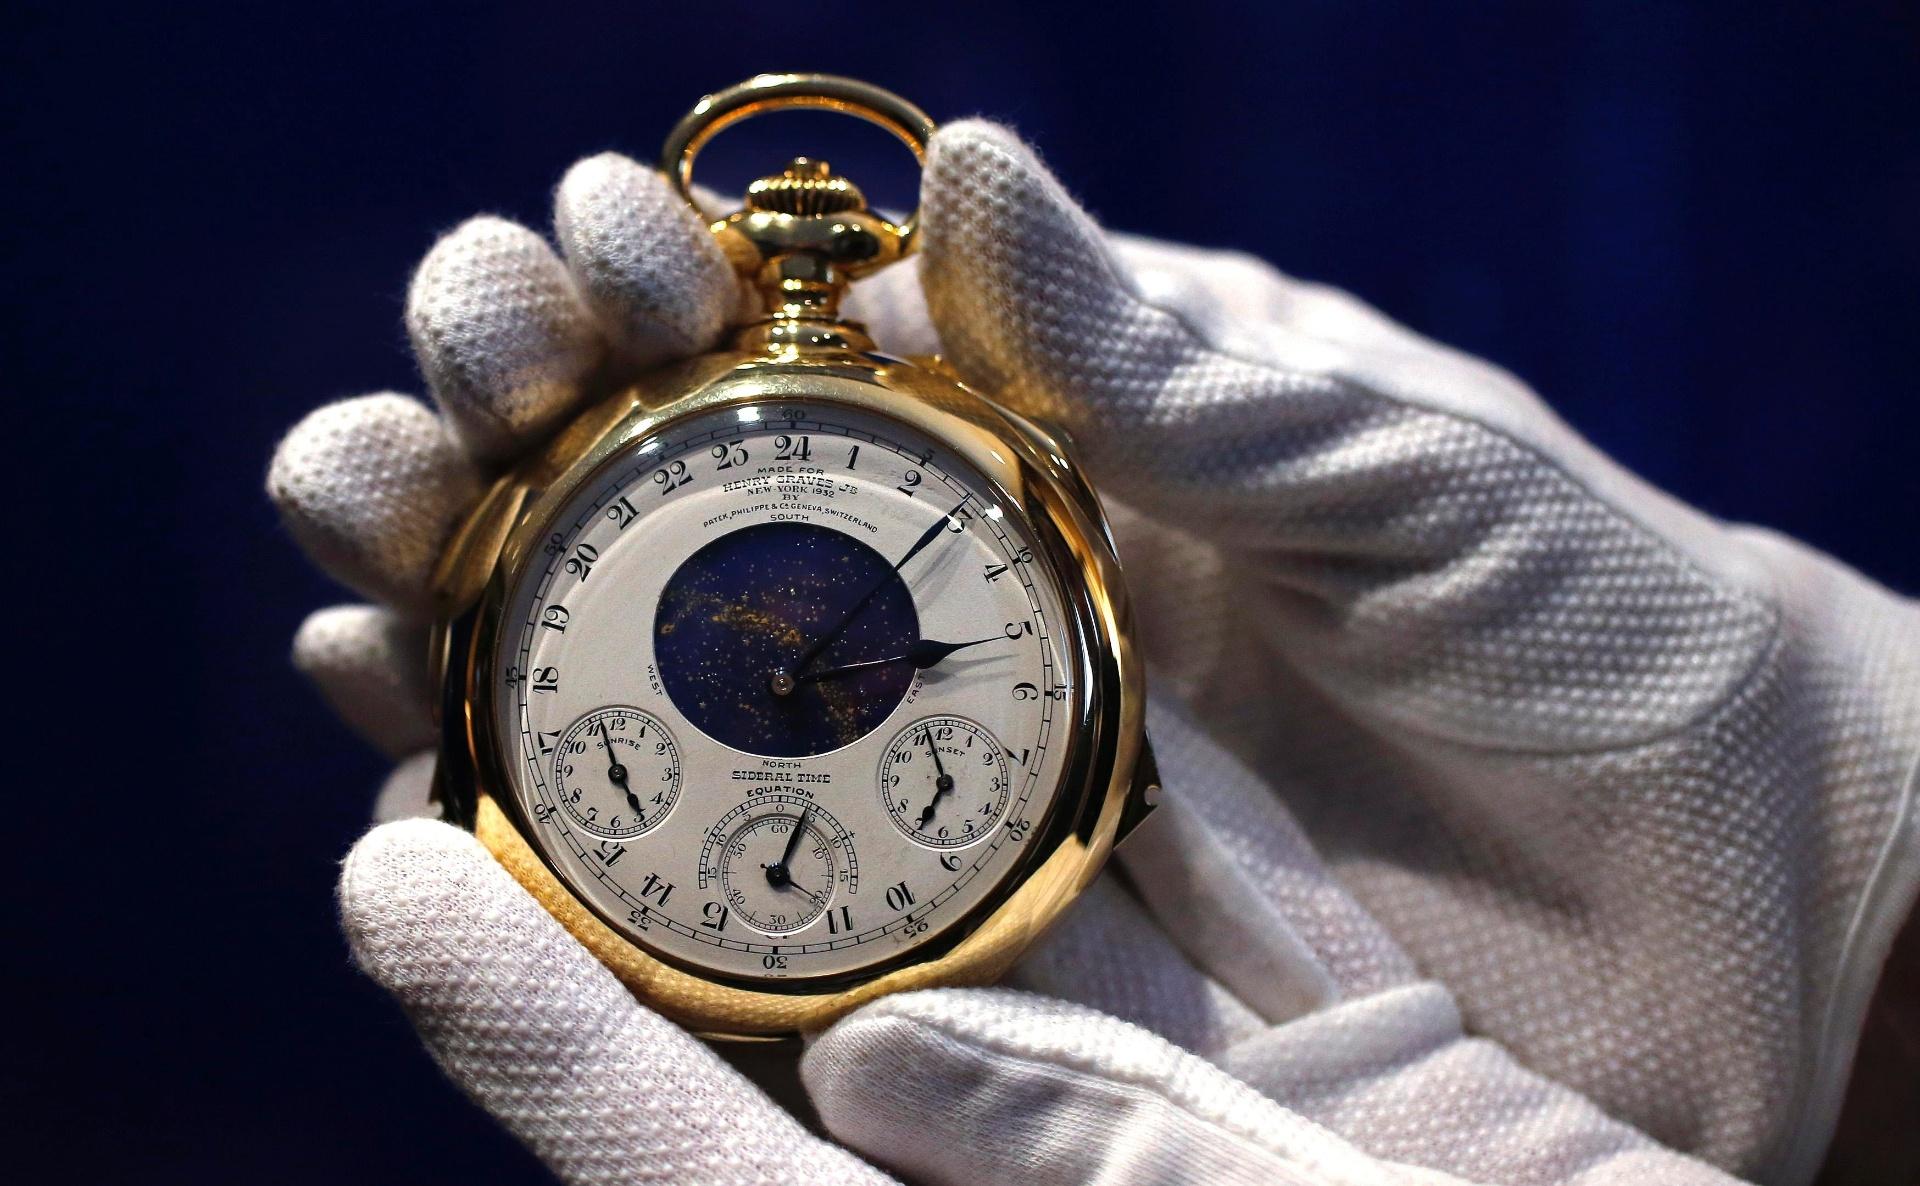 aa64d7edaf2 Fotos  Relógio de bolso de ouro bate recorde ao ser leiloado por R ...